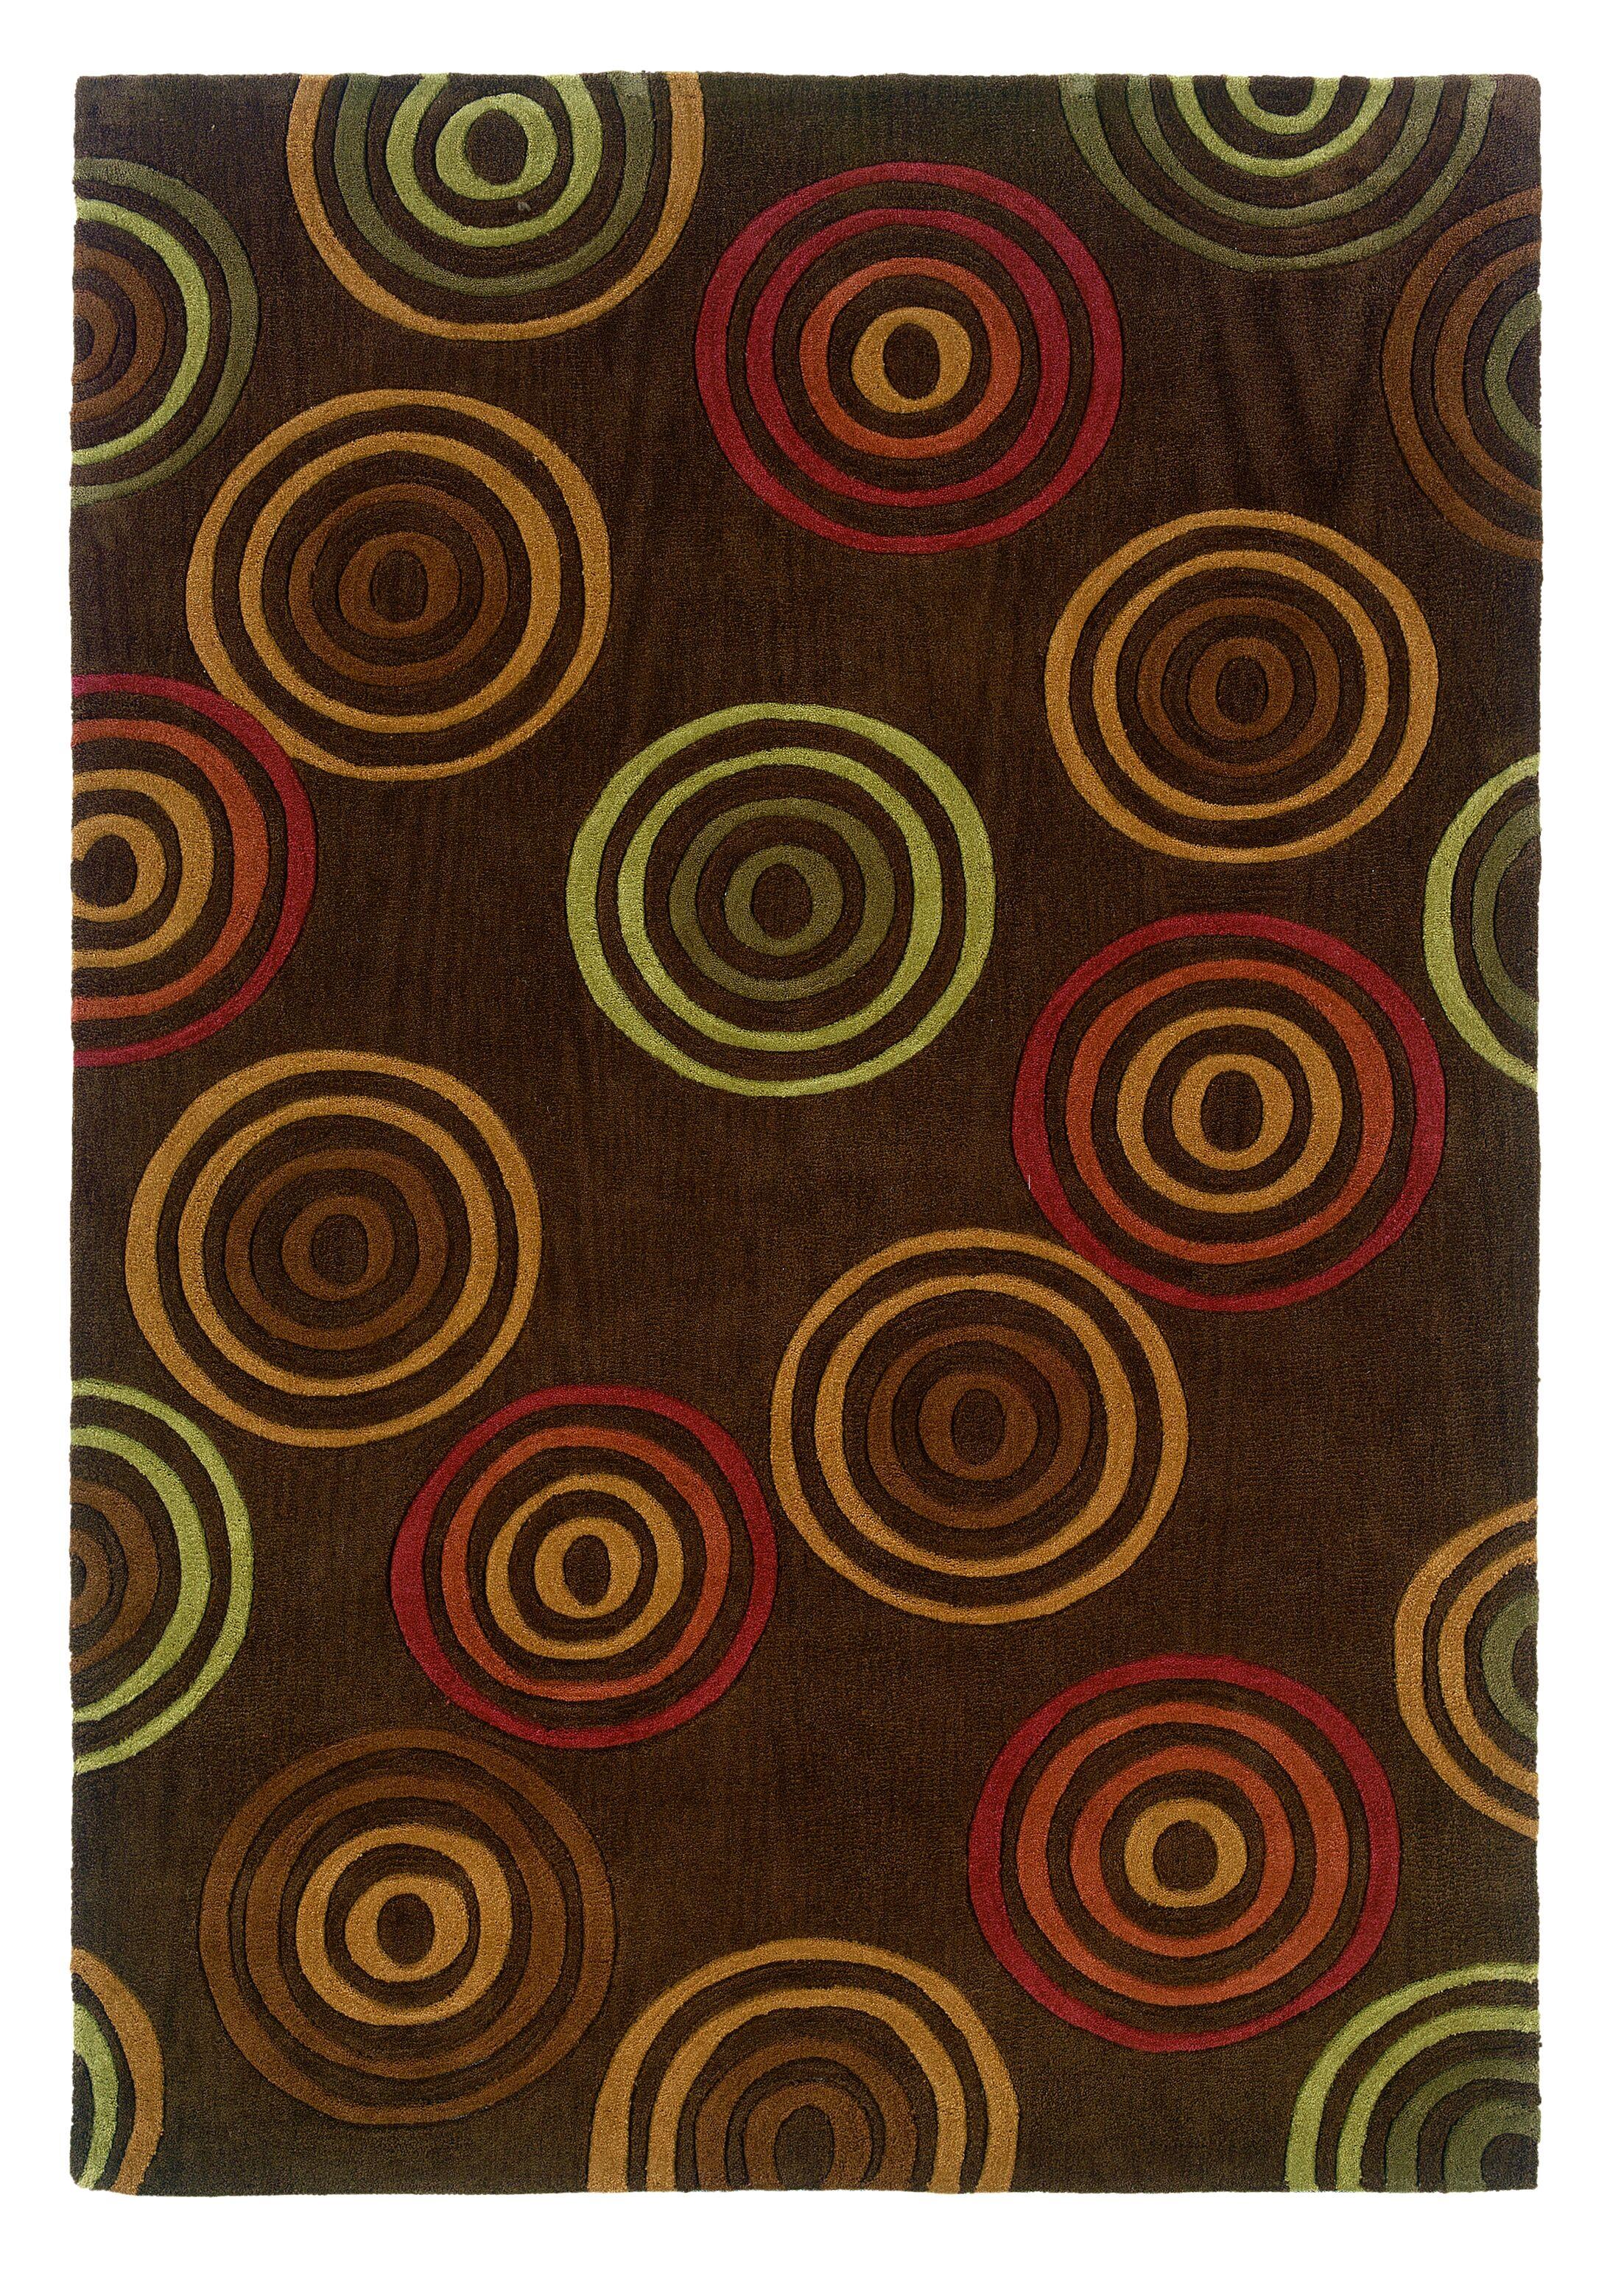 Bumpus Hand-Tufted Chocolate Area Rug Rug Size: 8' x 10'